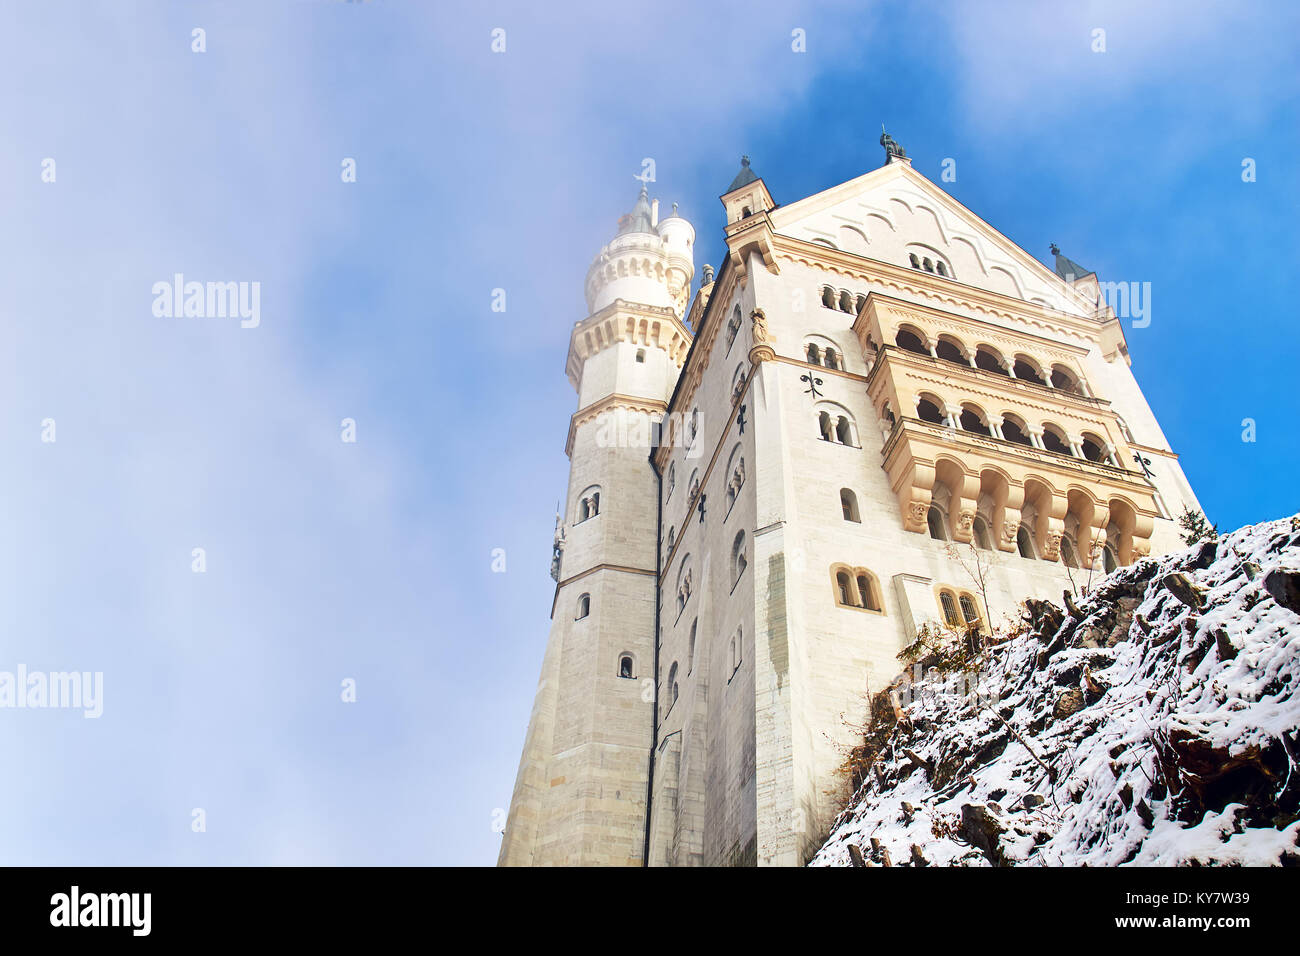 Fairytale Neuschwanstein castle during foggy winter day, Germany - Stock Image